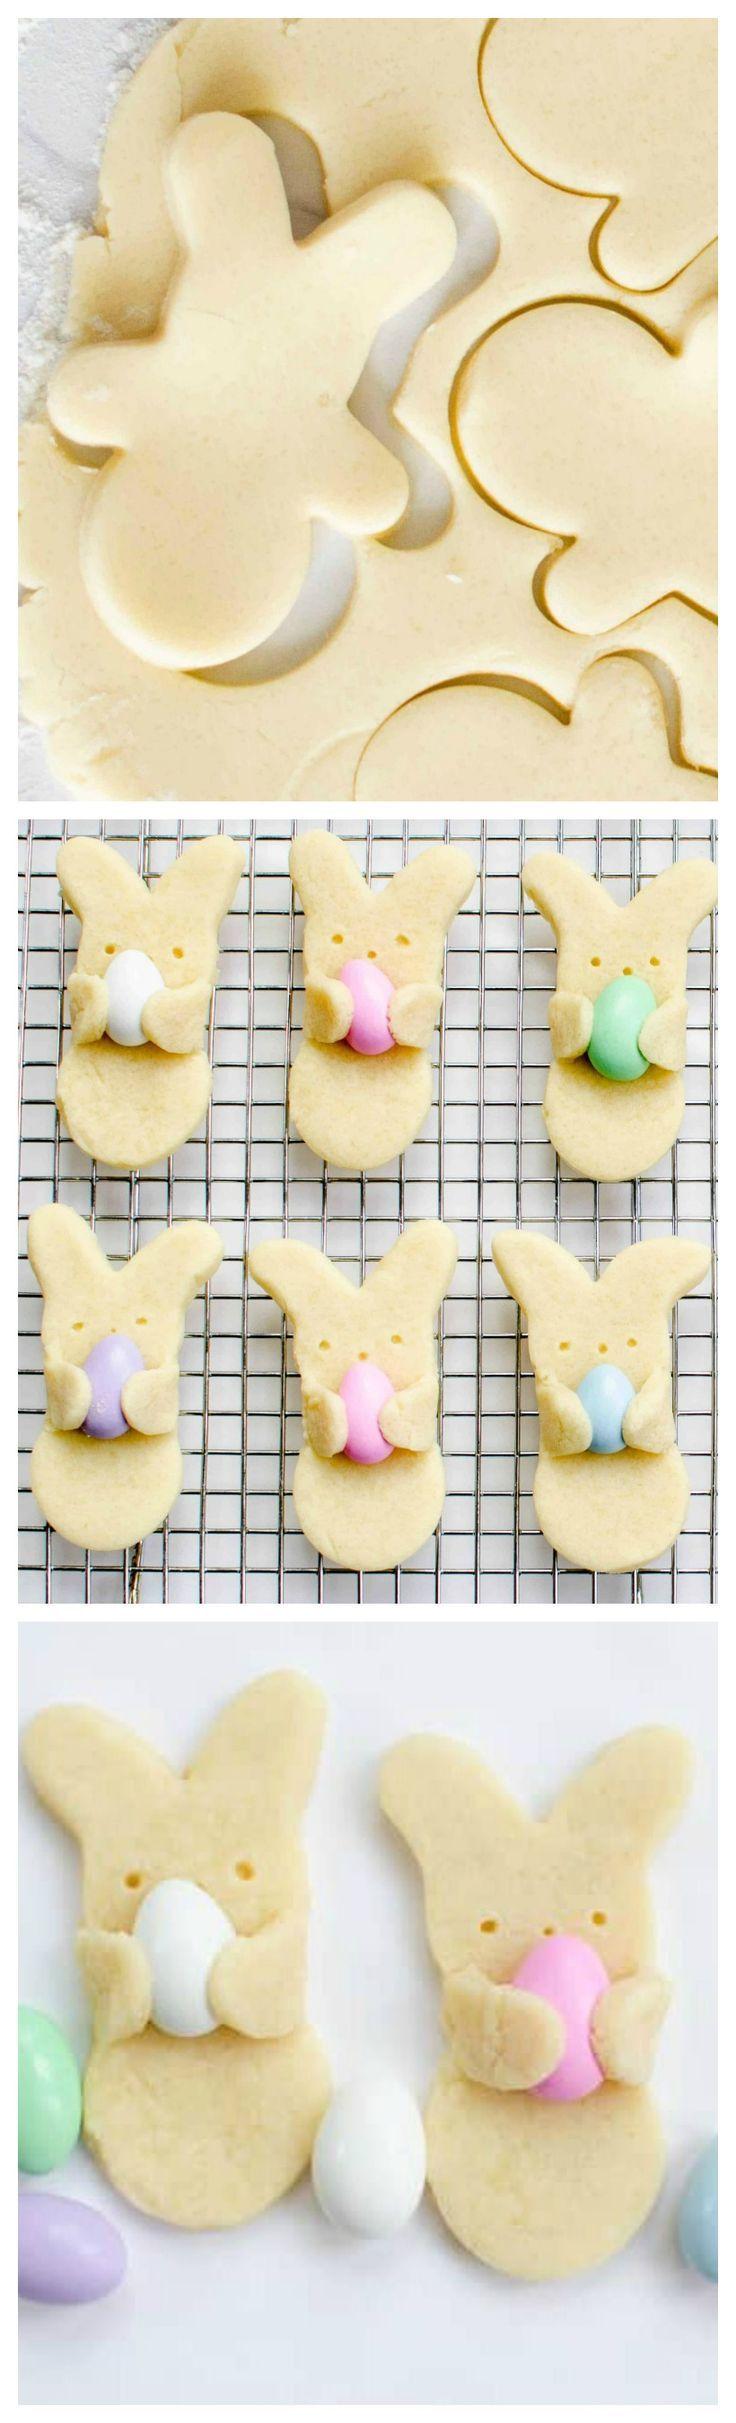 Adorable Easter Bunny Hug Cookies - Fun Loving Families